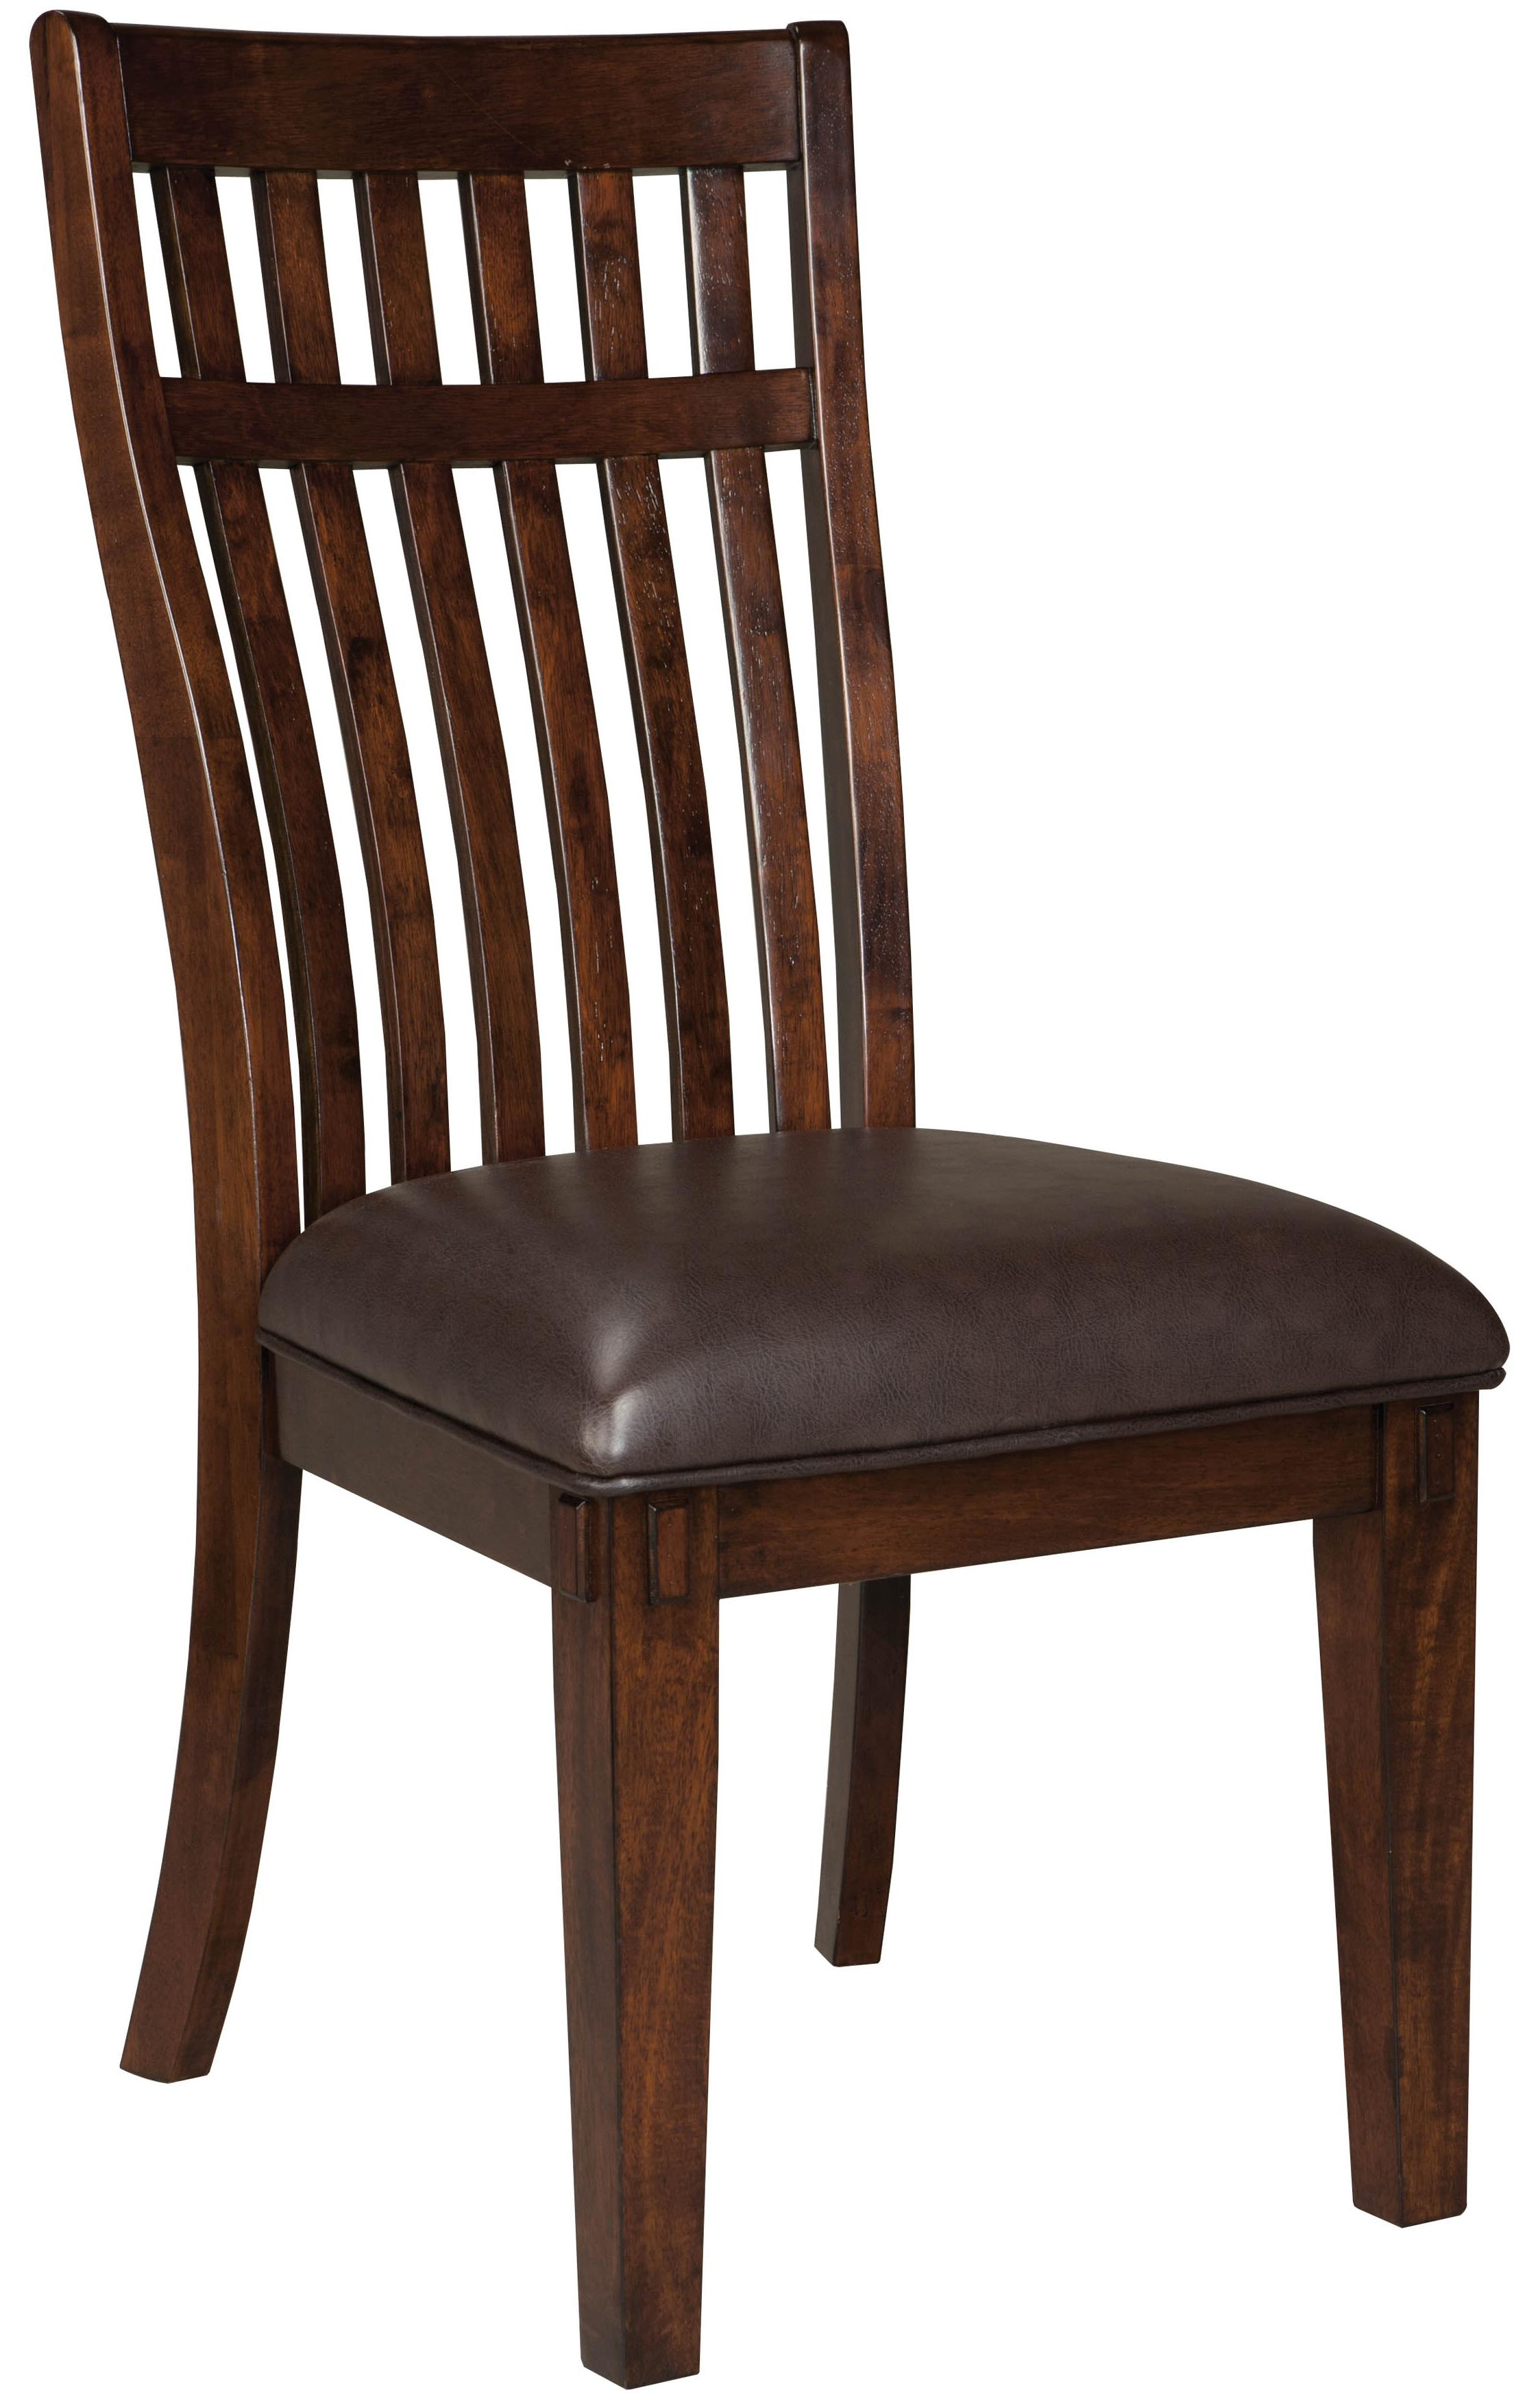 Standard Furniture Artisan Loft Side Chair - Item Number: 13624